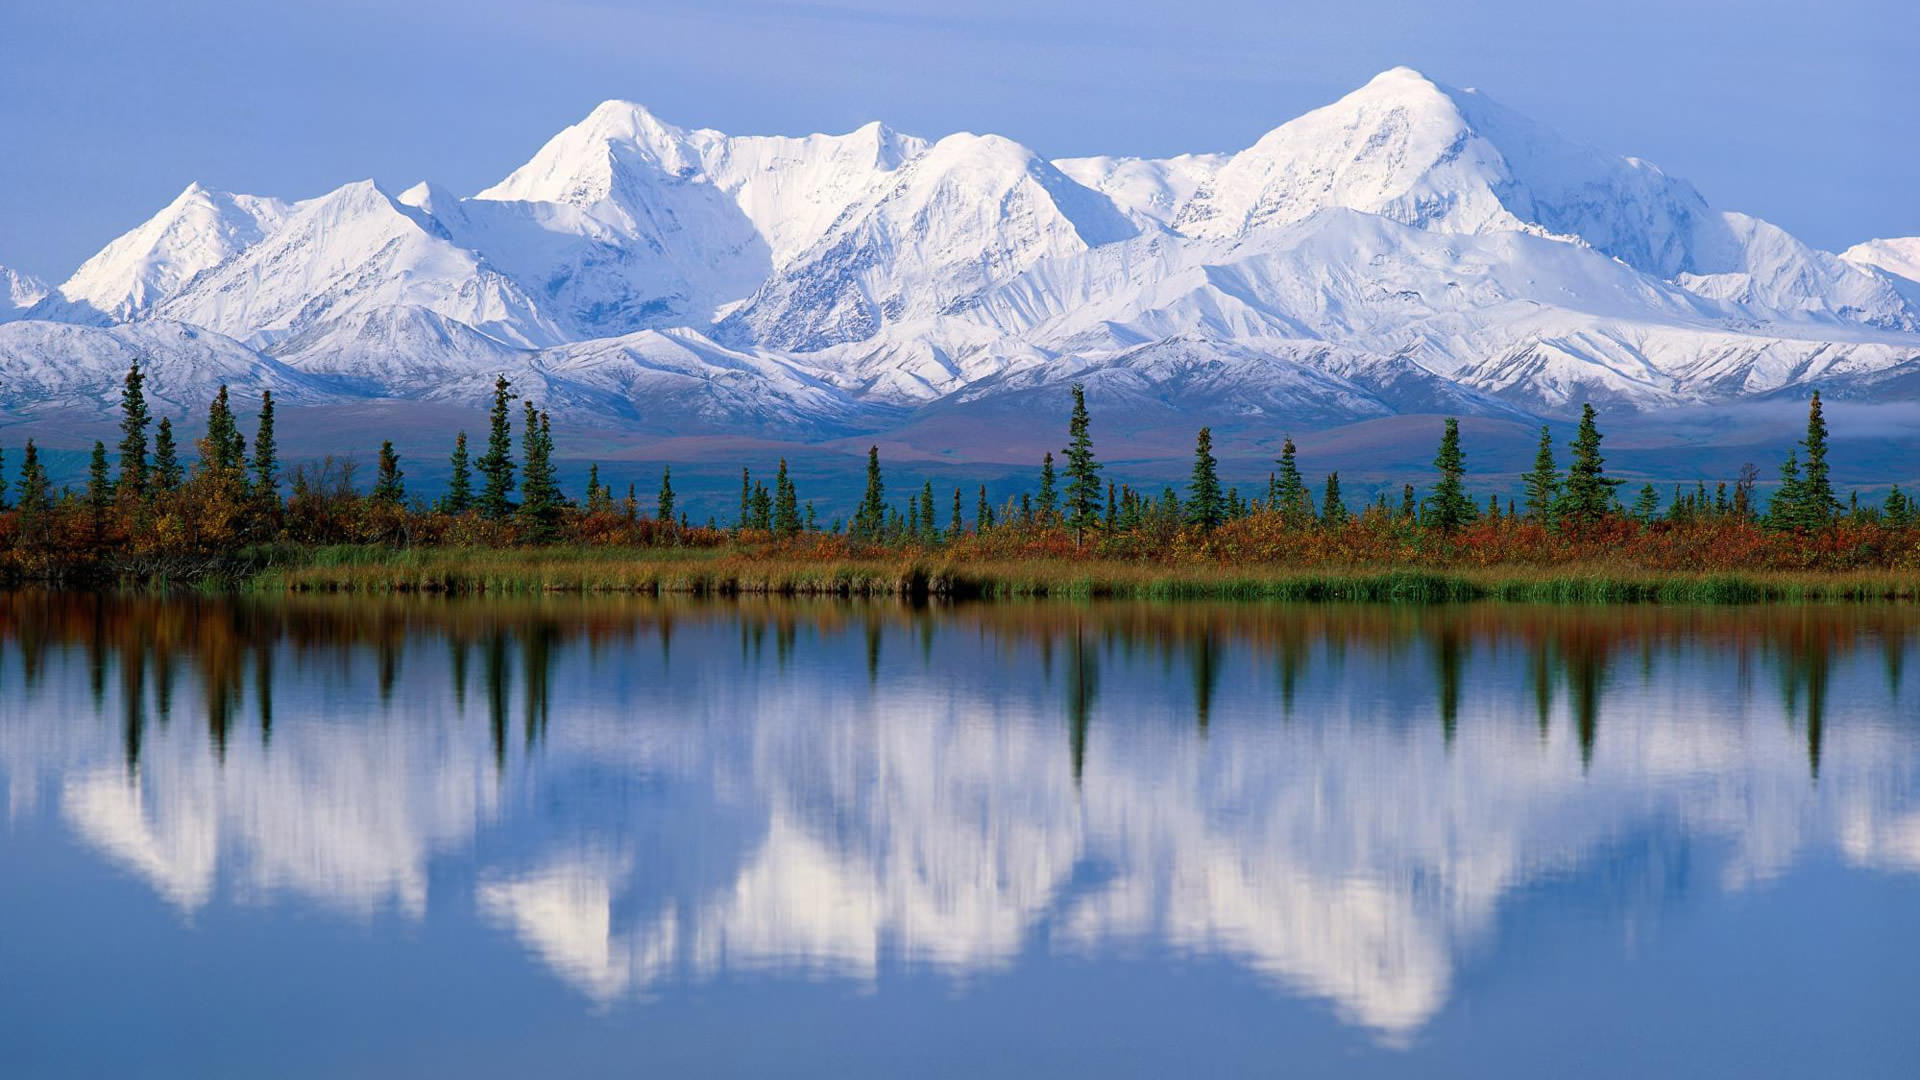 Alaska Scenery wallpaper   1044389 1920x1080